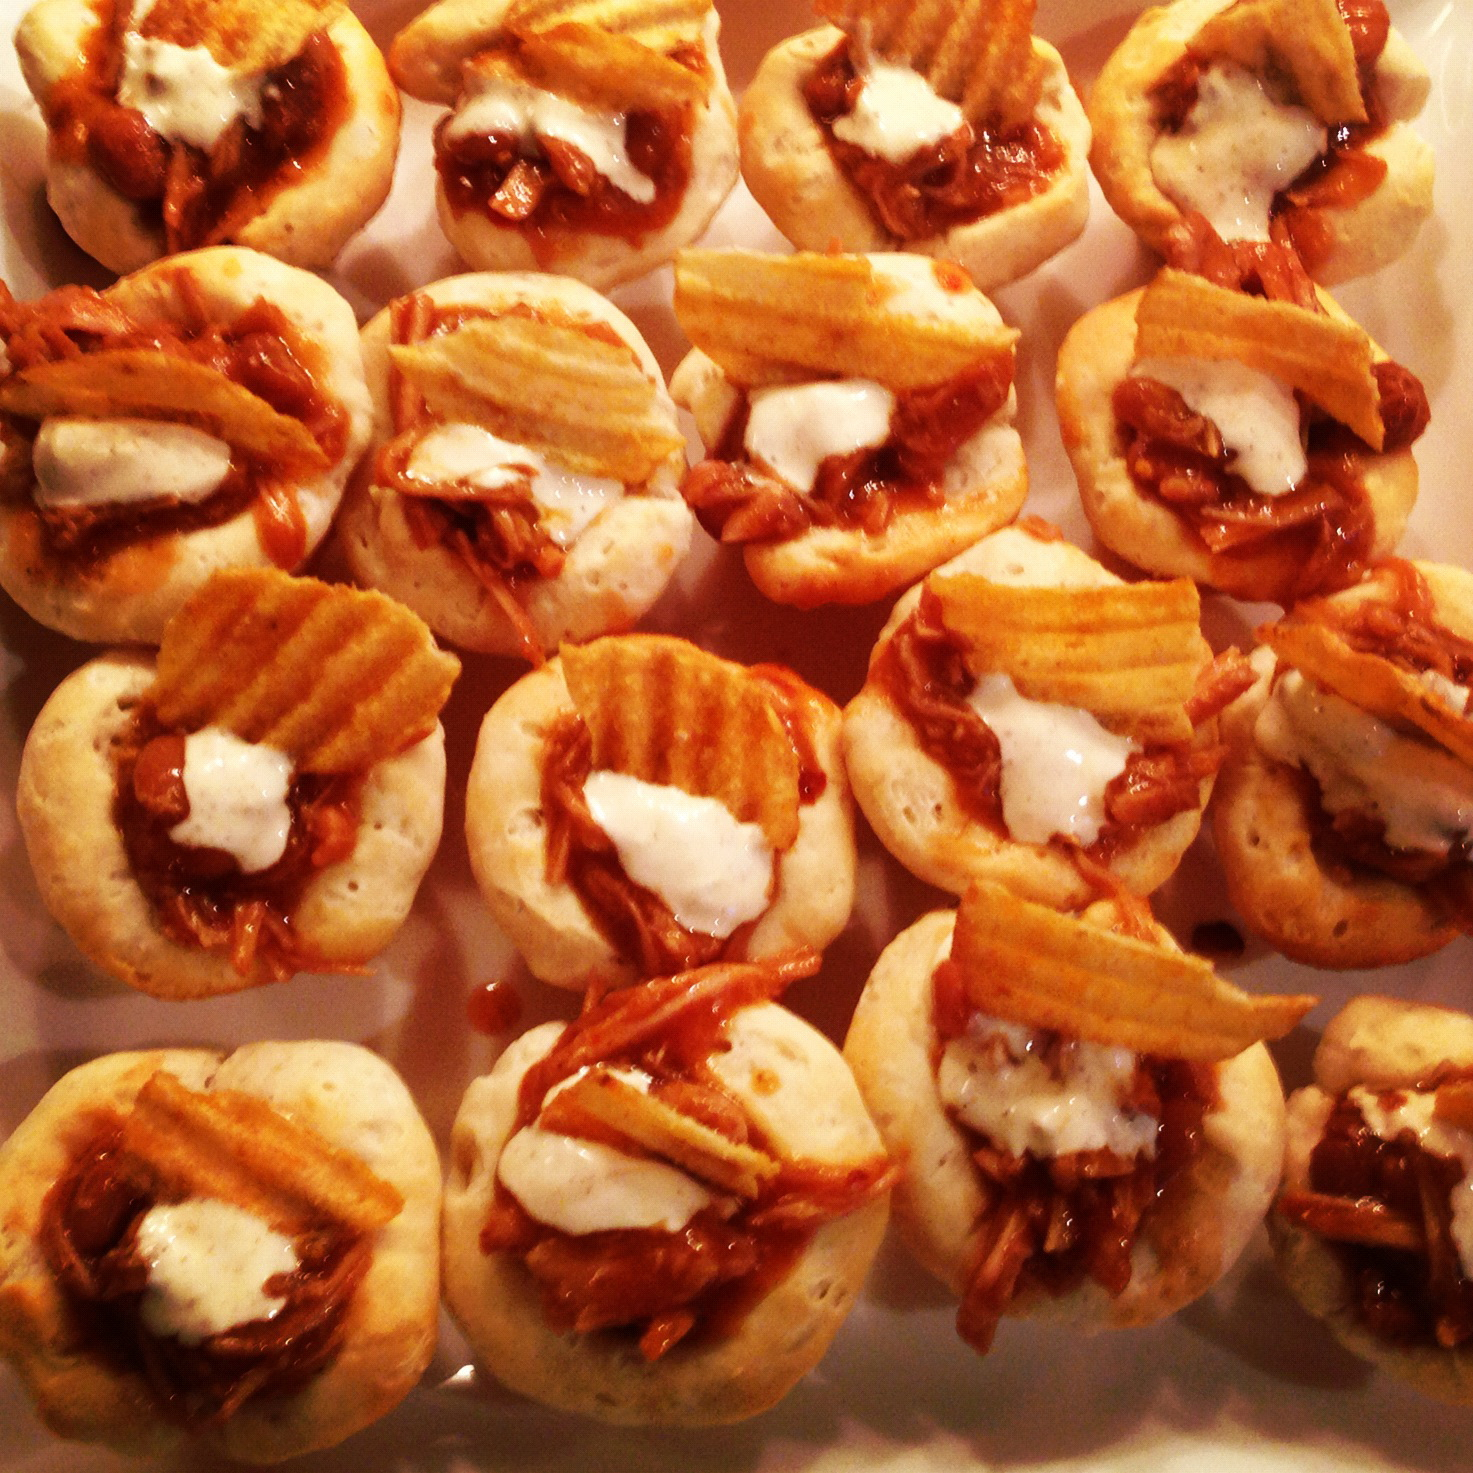 Maple Bacon Pulled Pork Baked Bean Bites - Abbey's Kitchen